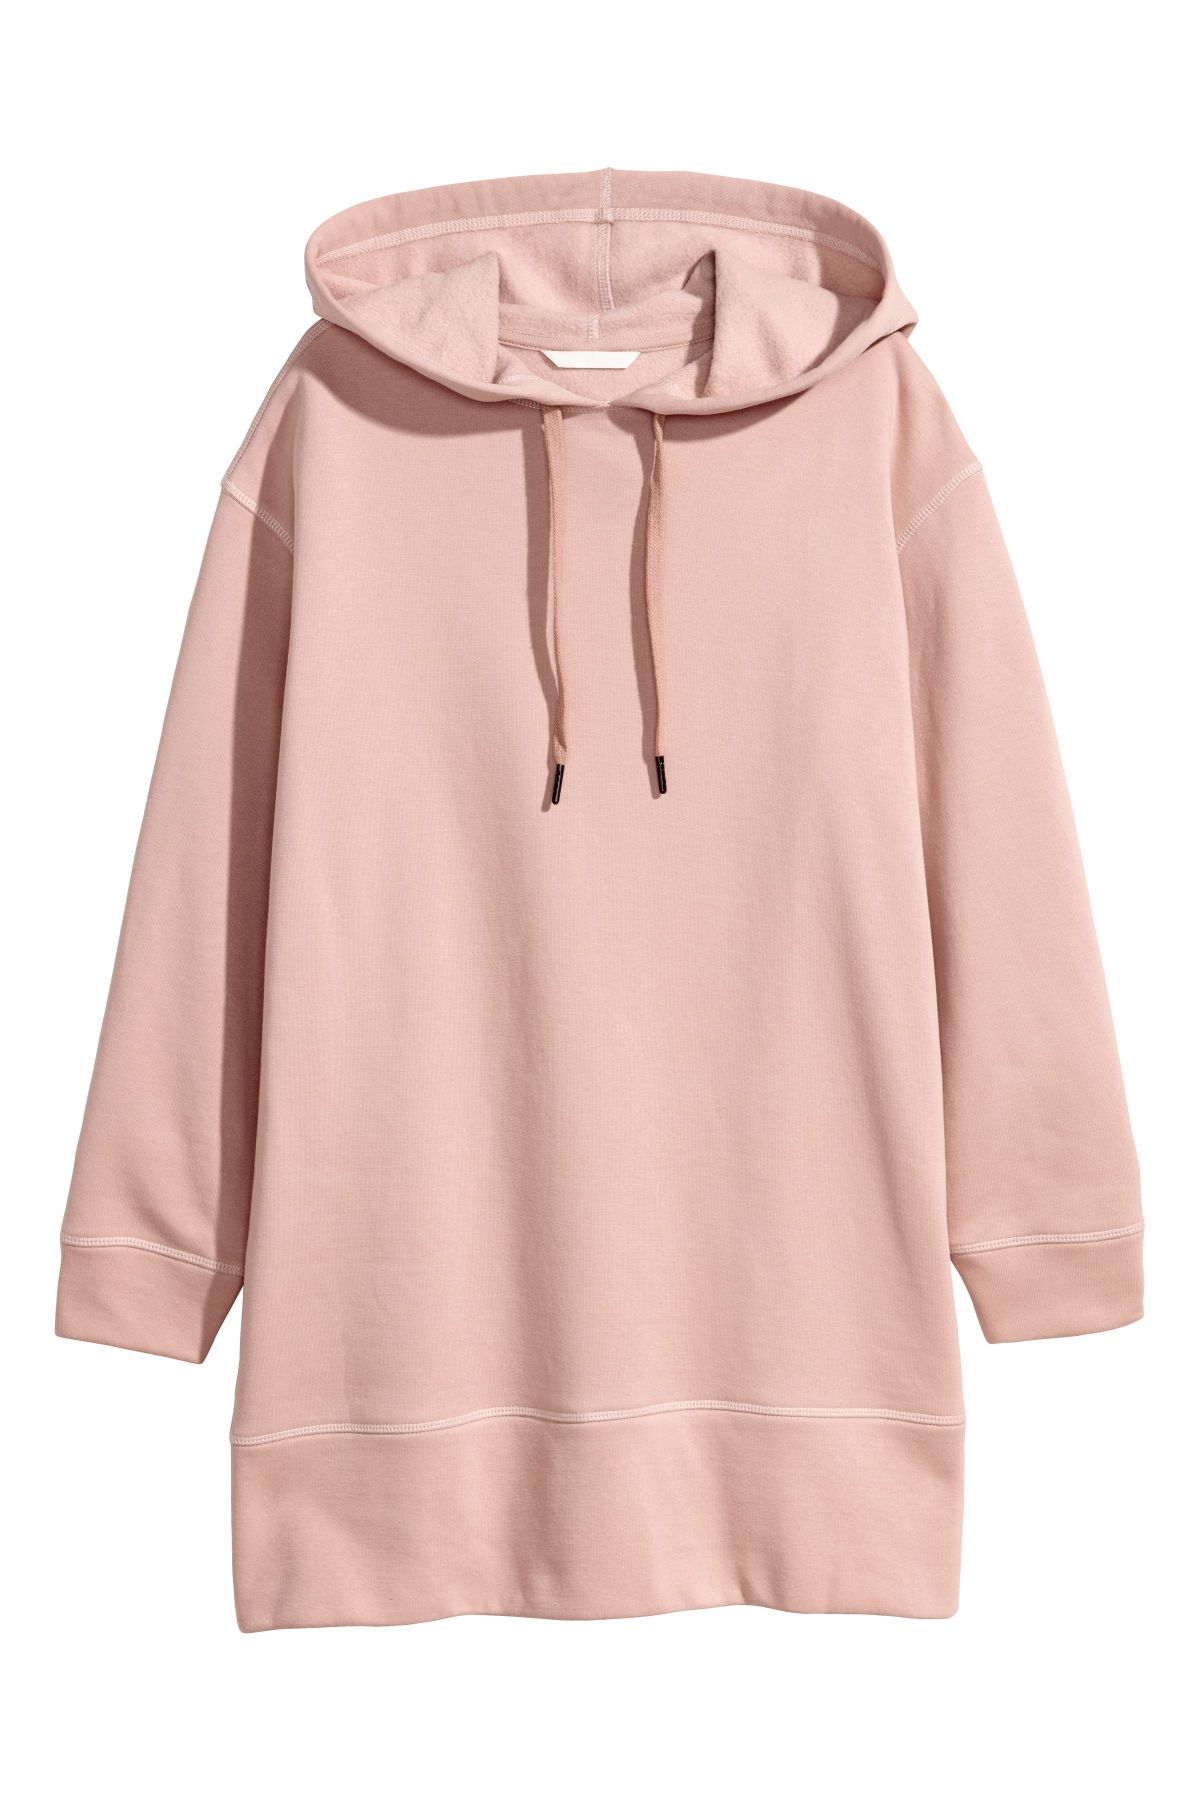 Oversize Hoodie Puderrosa Damen H M De Kapuzenpulli Hoodie Sweatshirts Kapuzenjacke